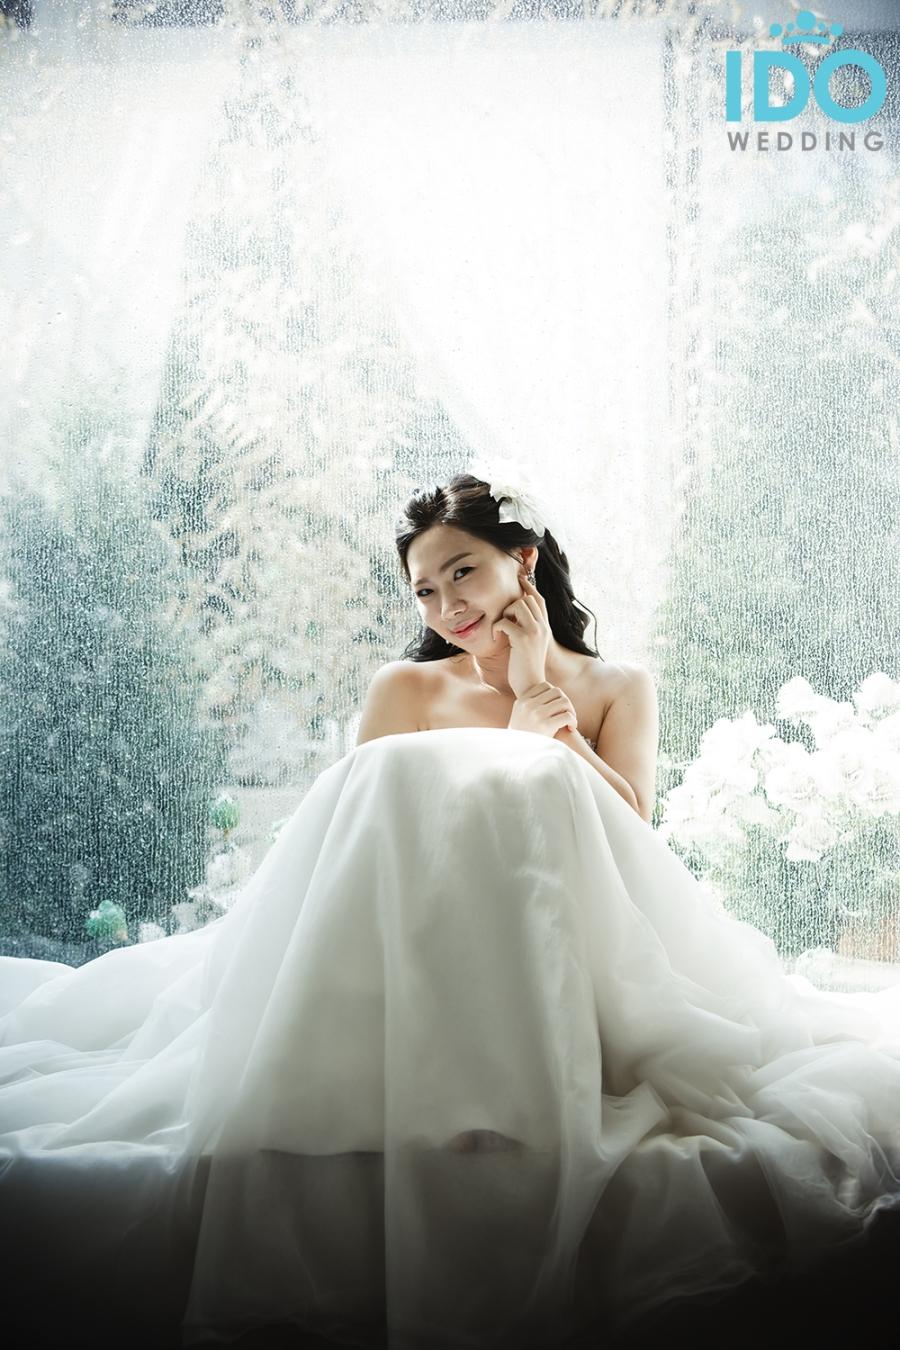 koreanweddingphotography_0BBN1506 copy